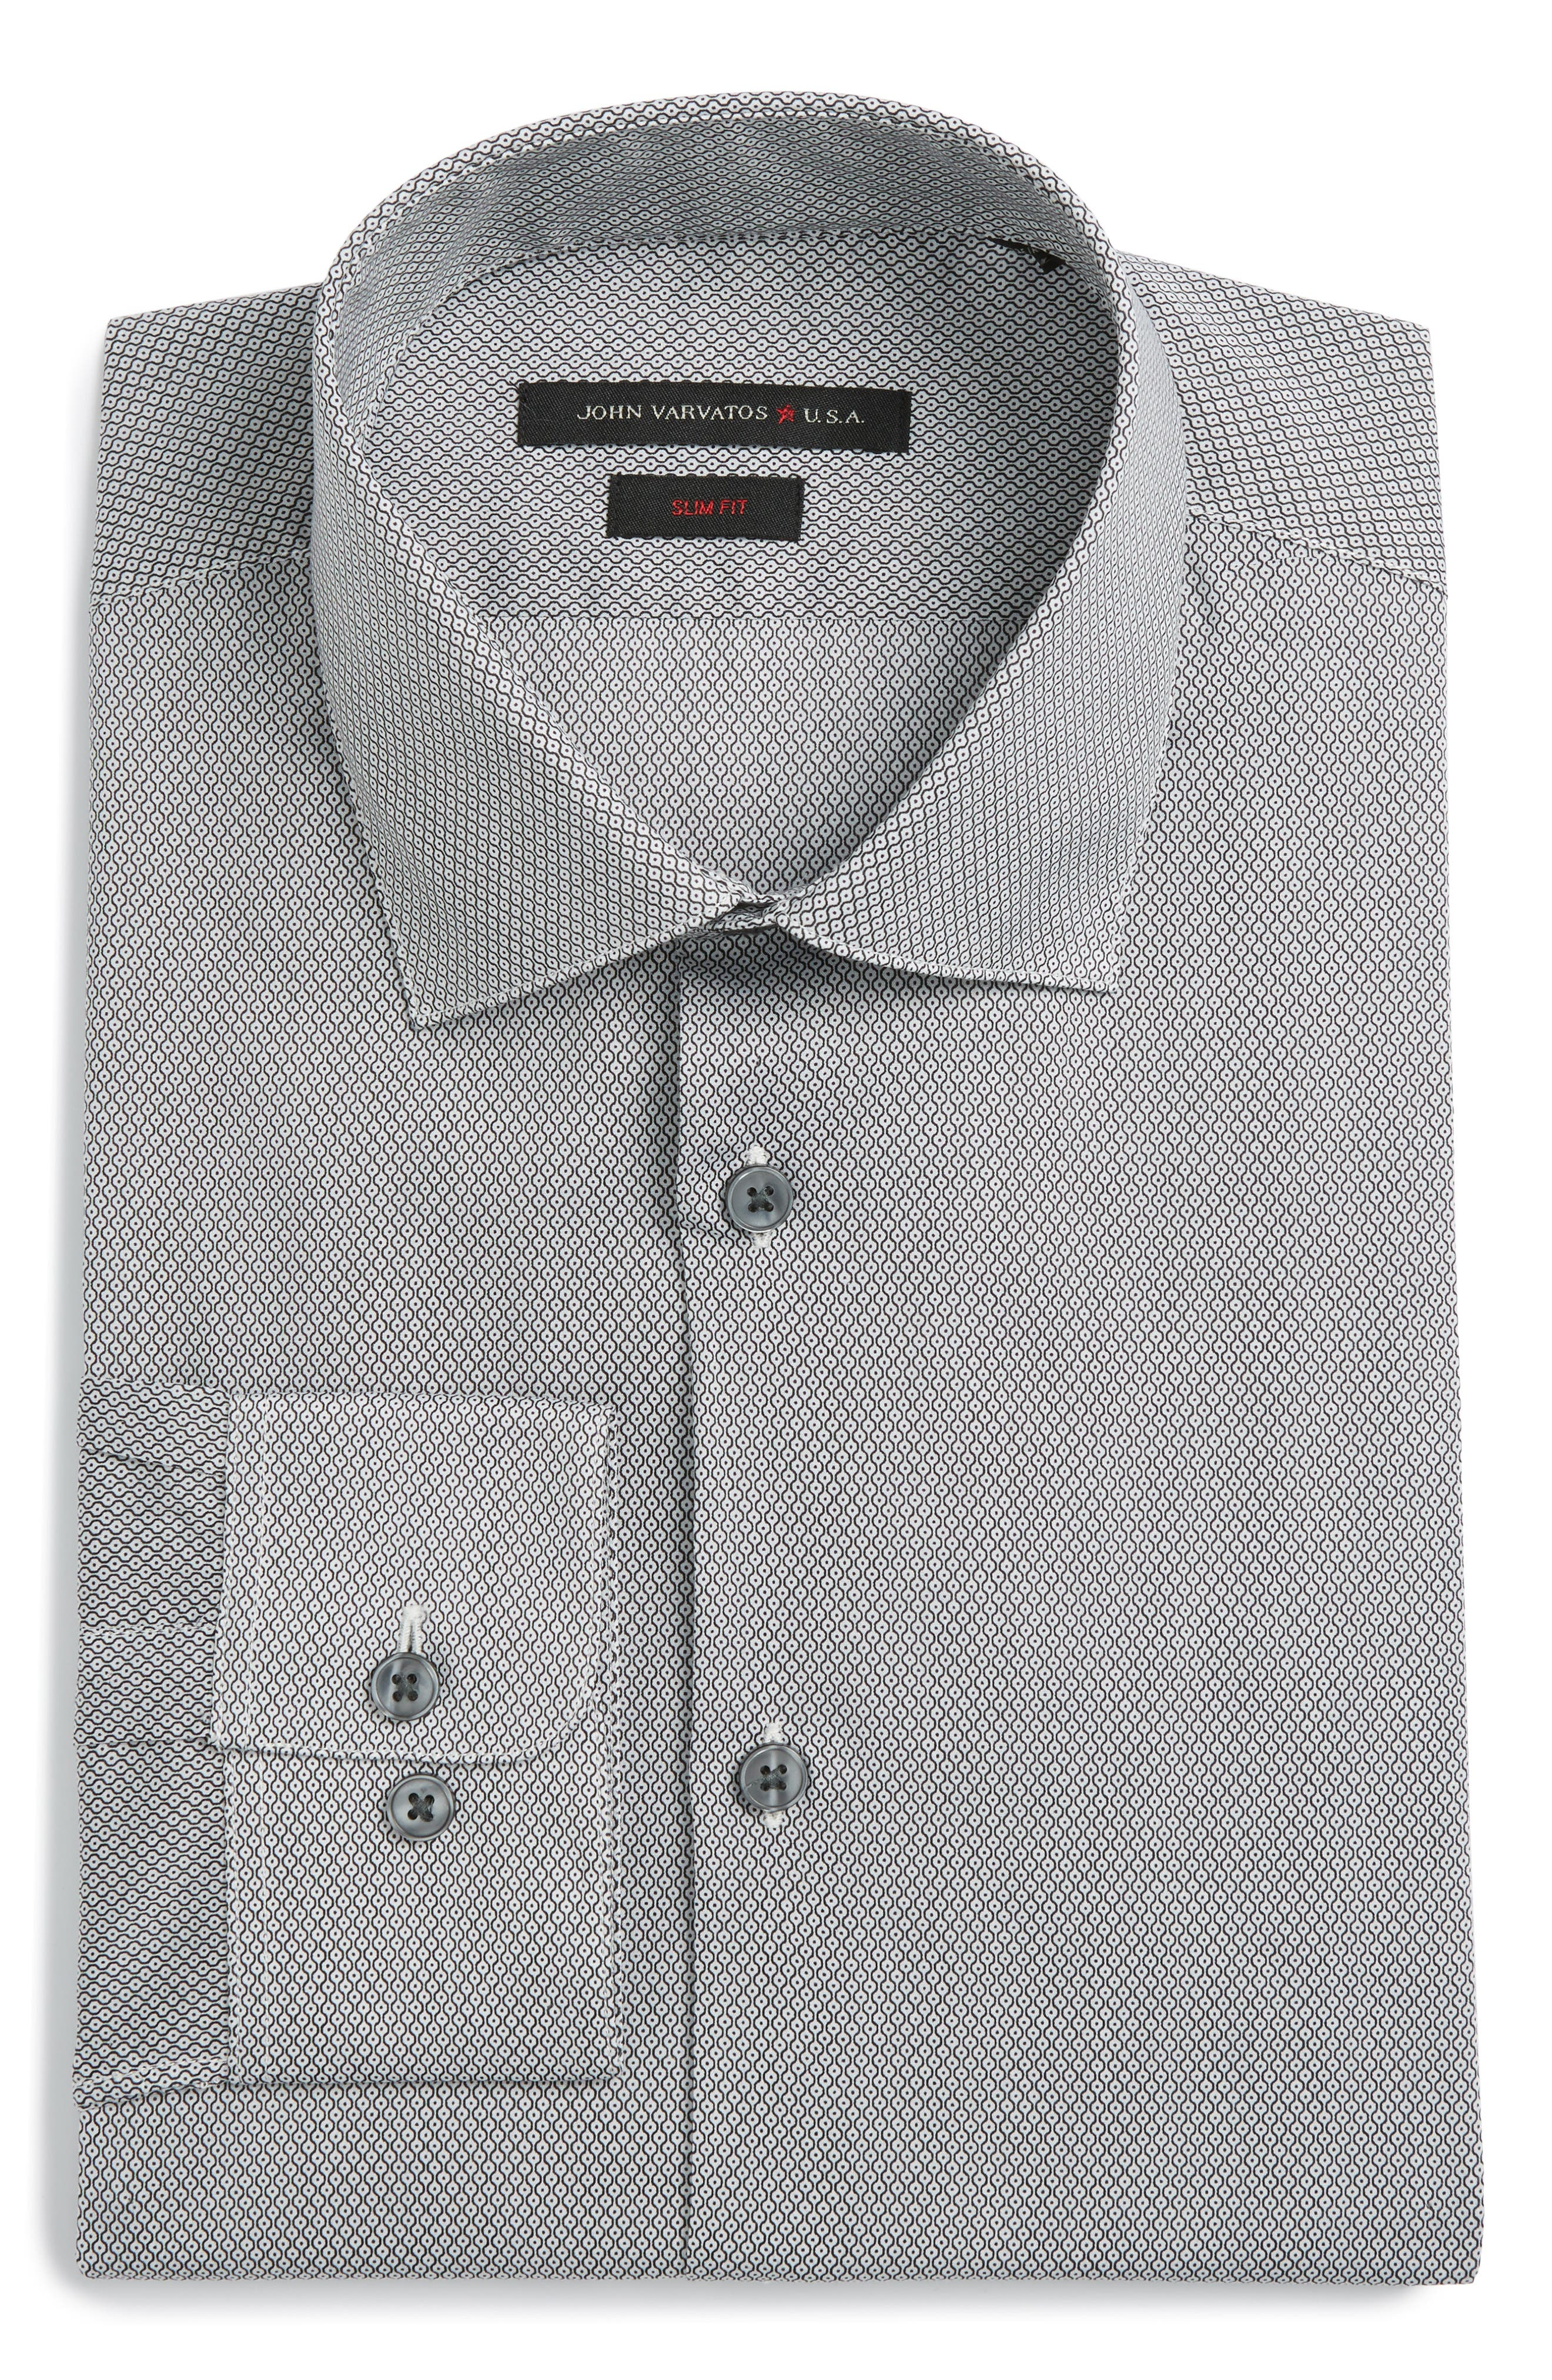 Slim Fit Geometric Dress Shirt,                         Main,                         color, 006